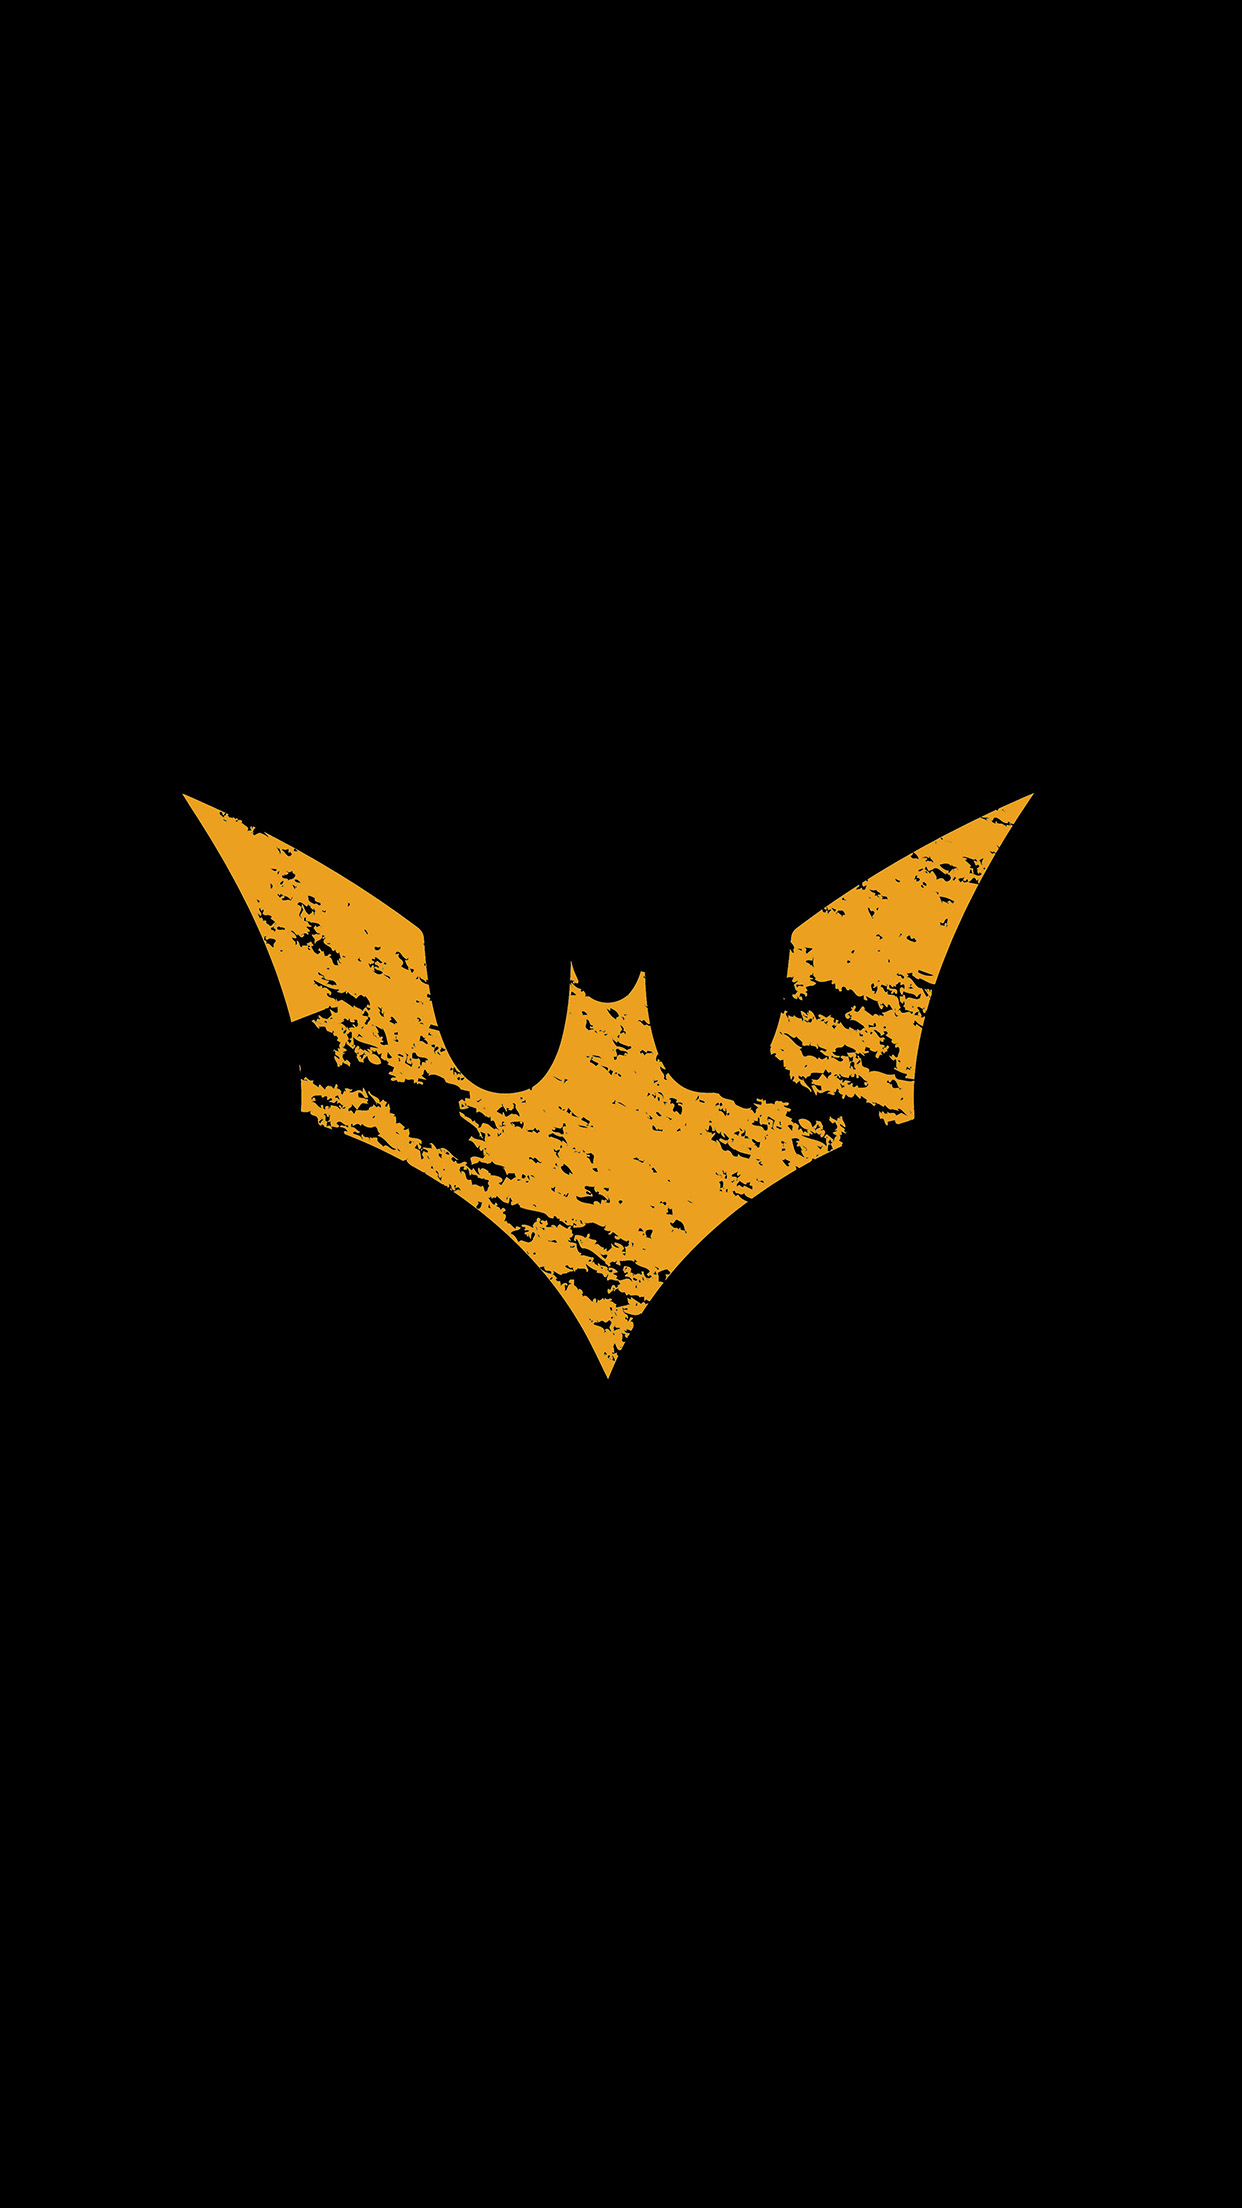 Iphone6papers Com Iphone 6 Wallpaper Ap17 Batman Logo Yellow